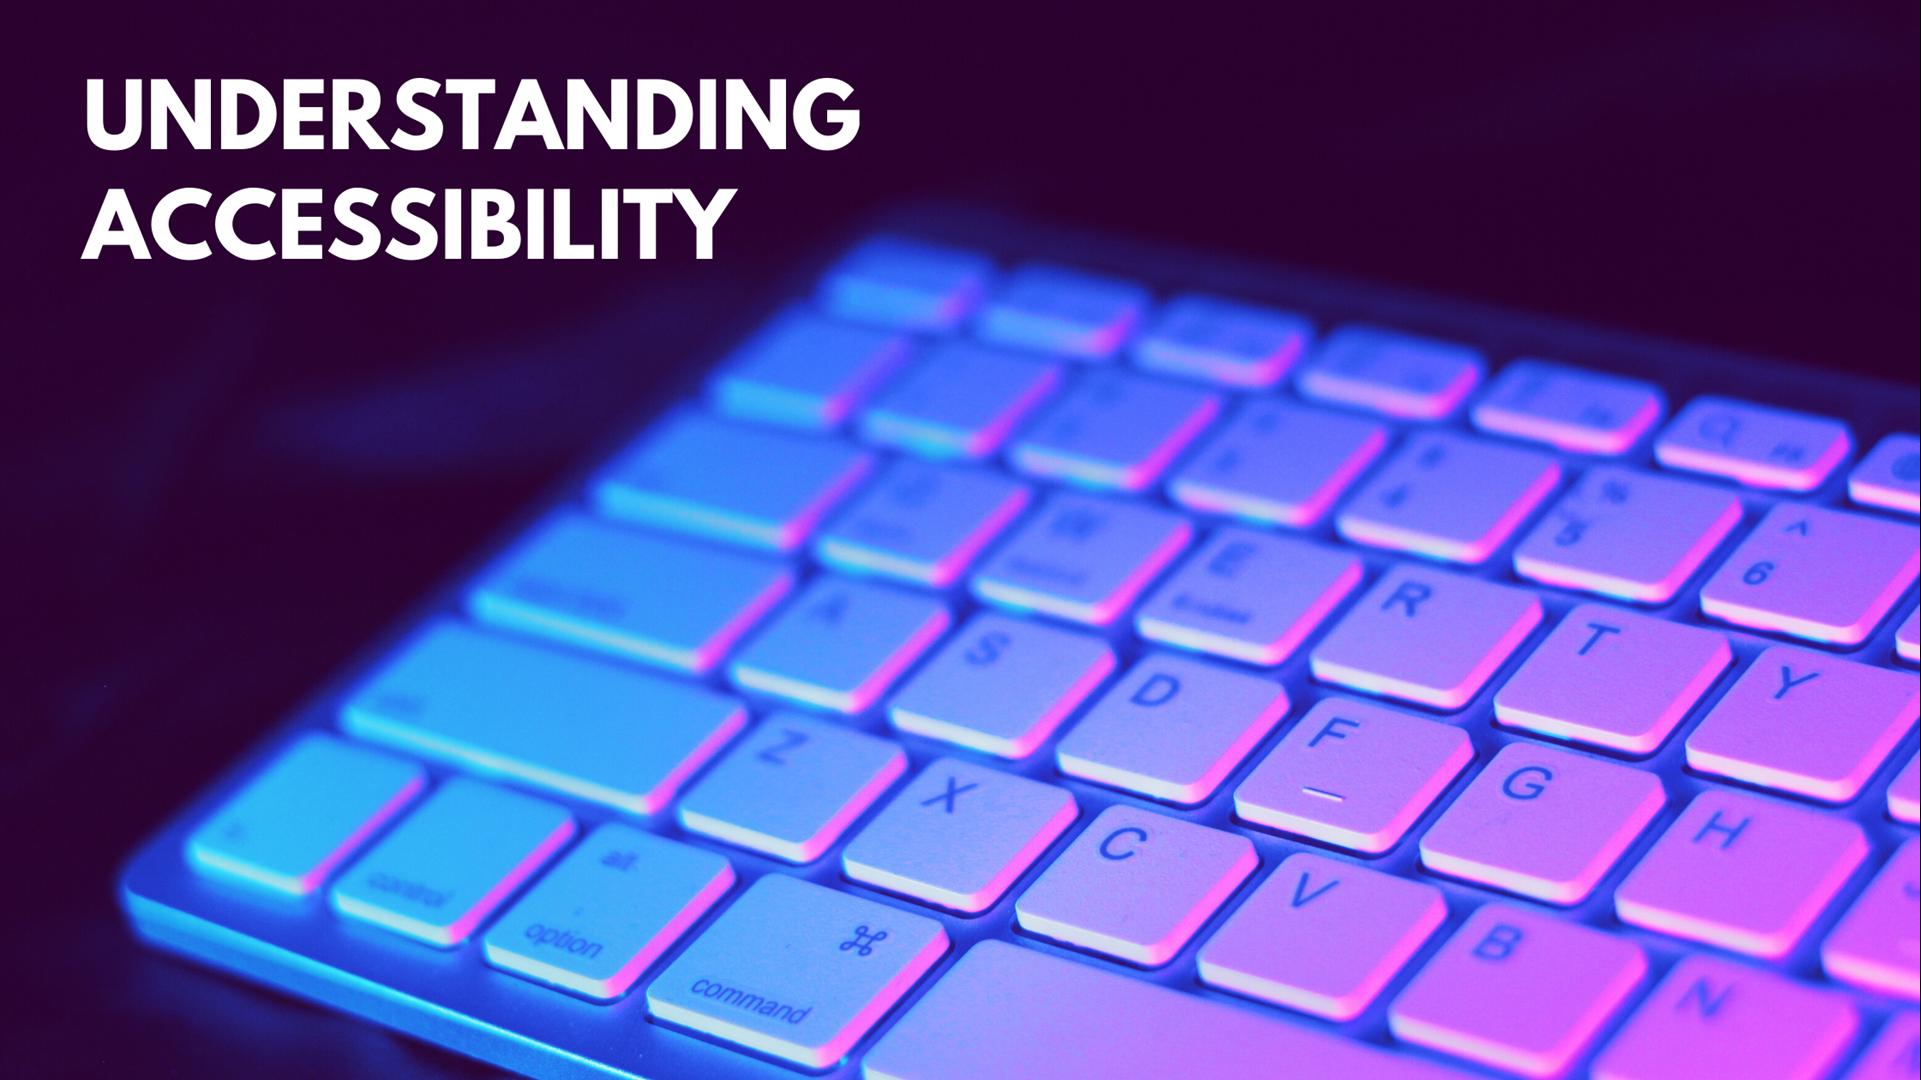 Edge Summer 2020: Understanding Accessibility